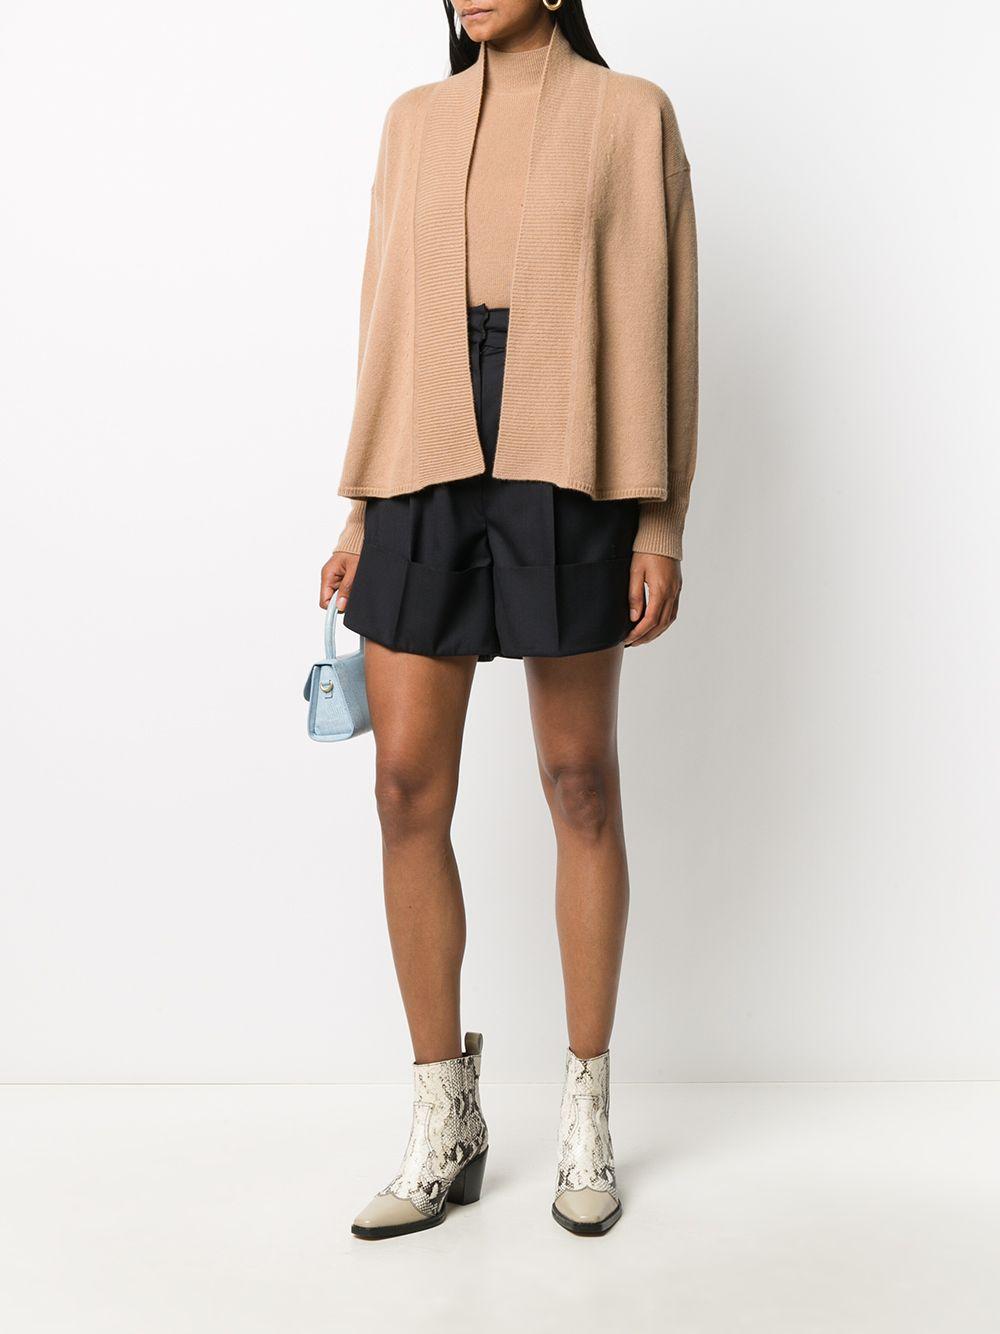 Beige virgin wool-cashmere blend open-front cardigan  FORTE_FORTE |  | 7626CAMMELLO